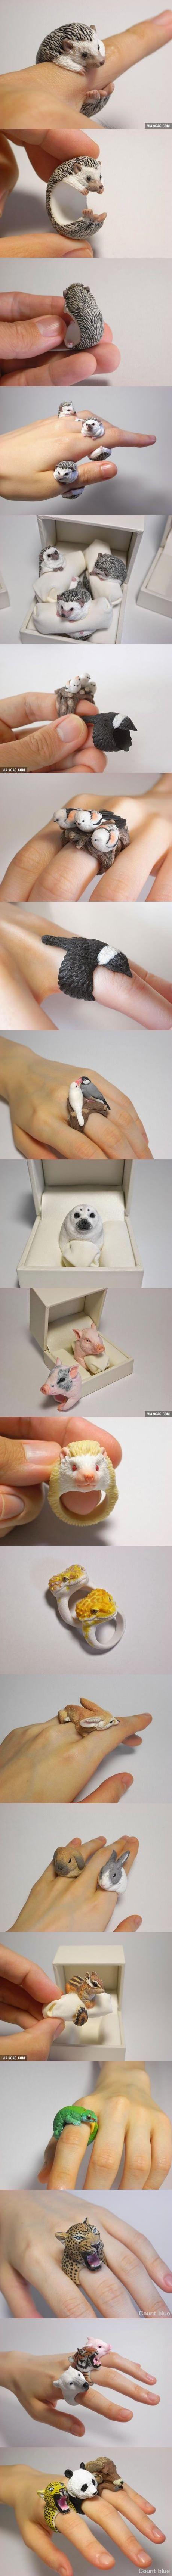 Very Realistic Animal Rings By Jiro Miura